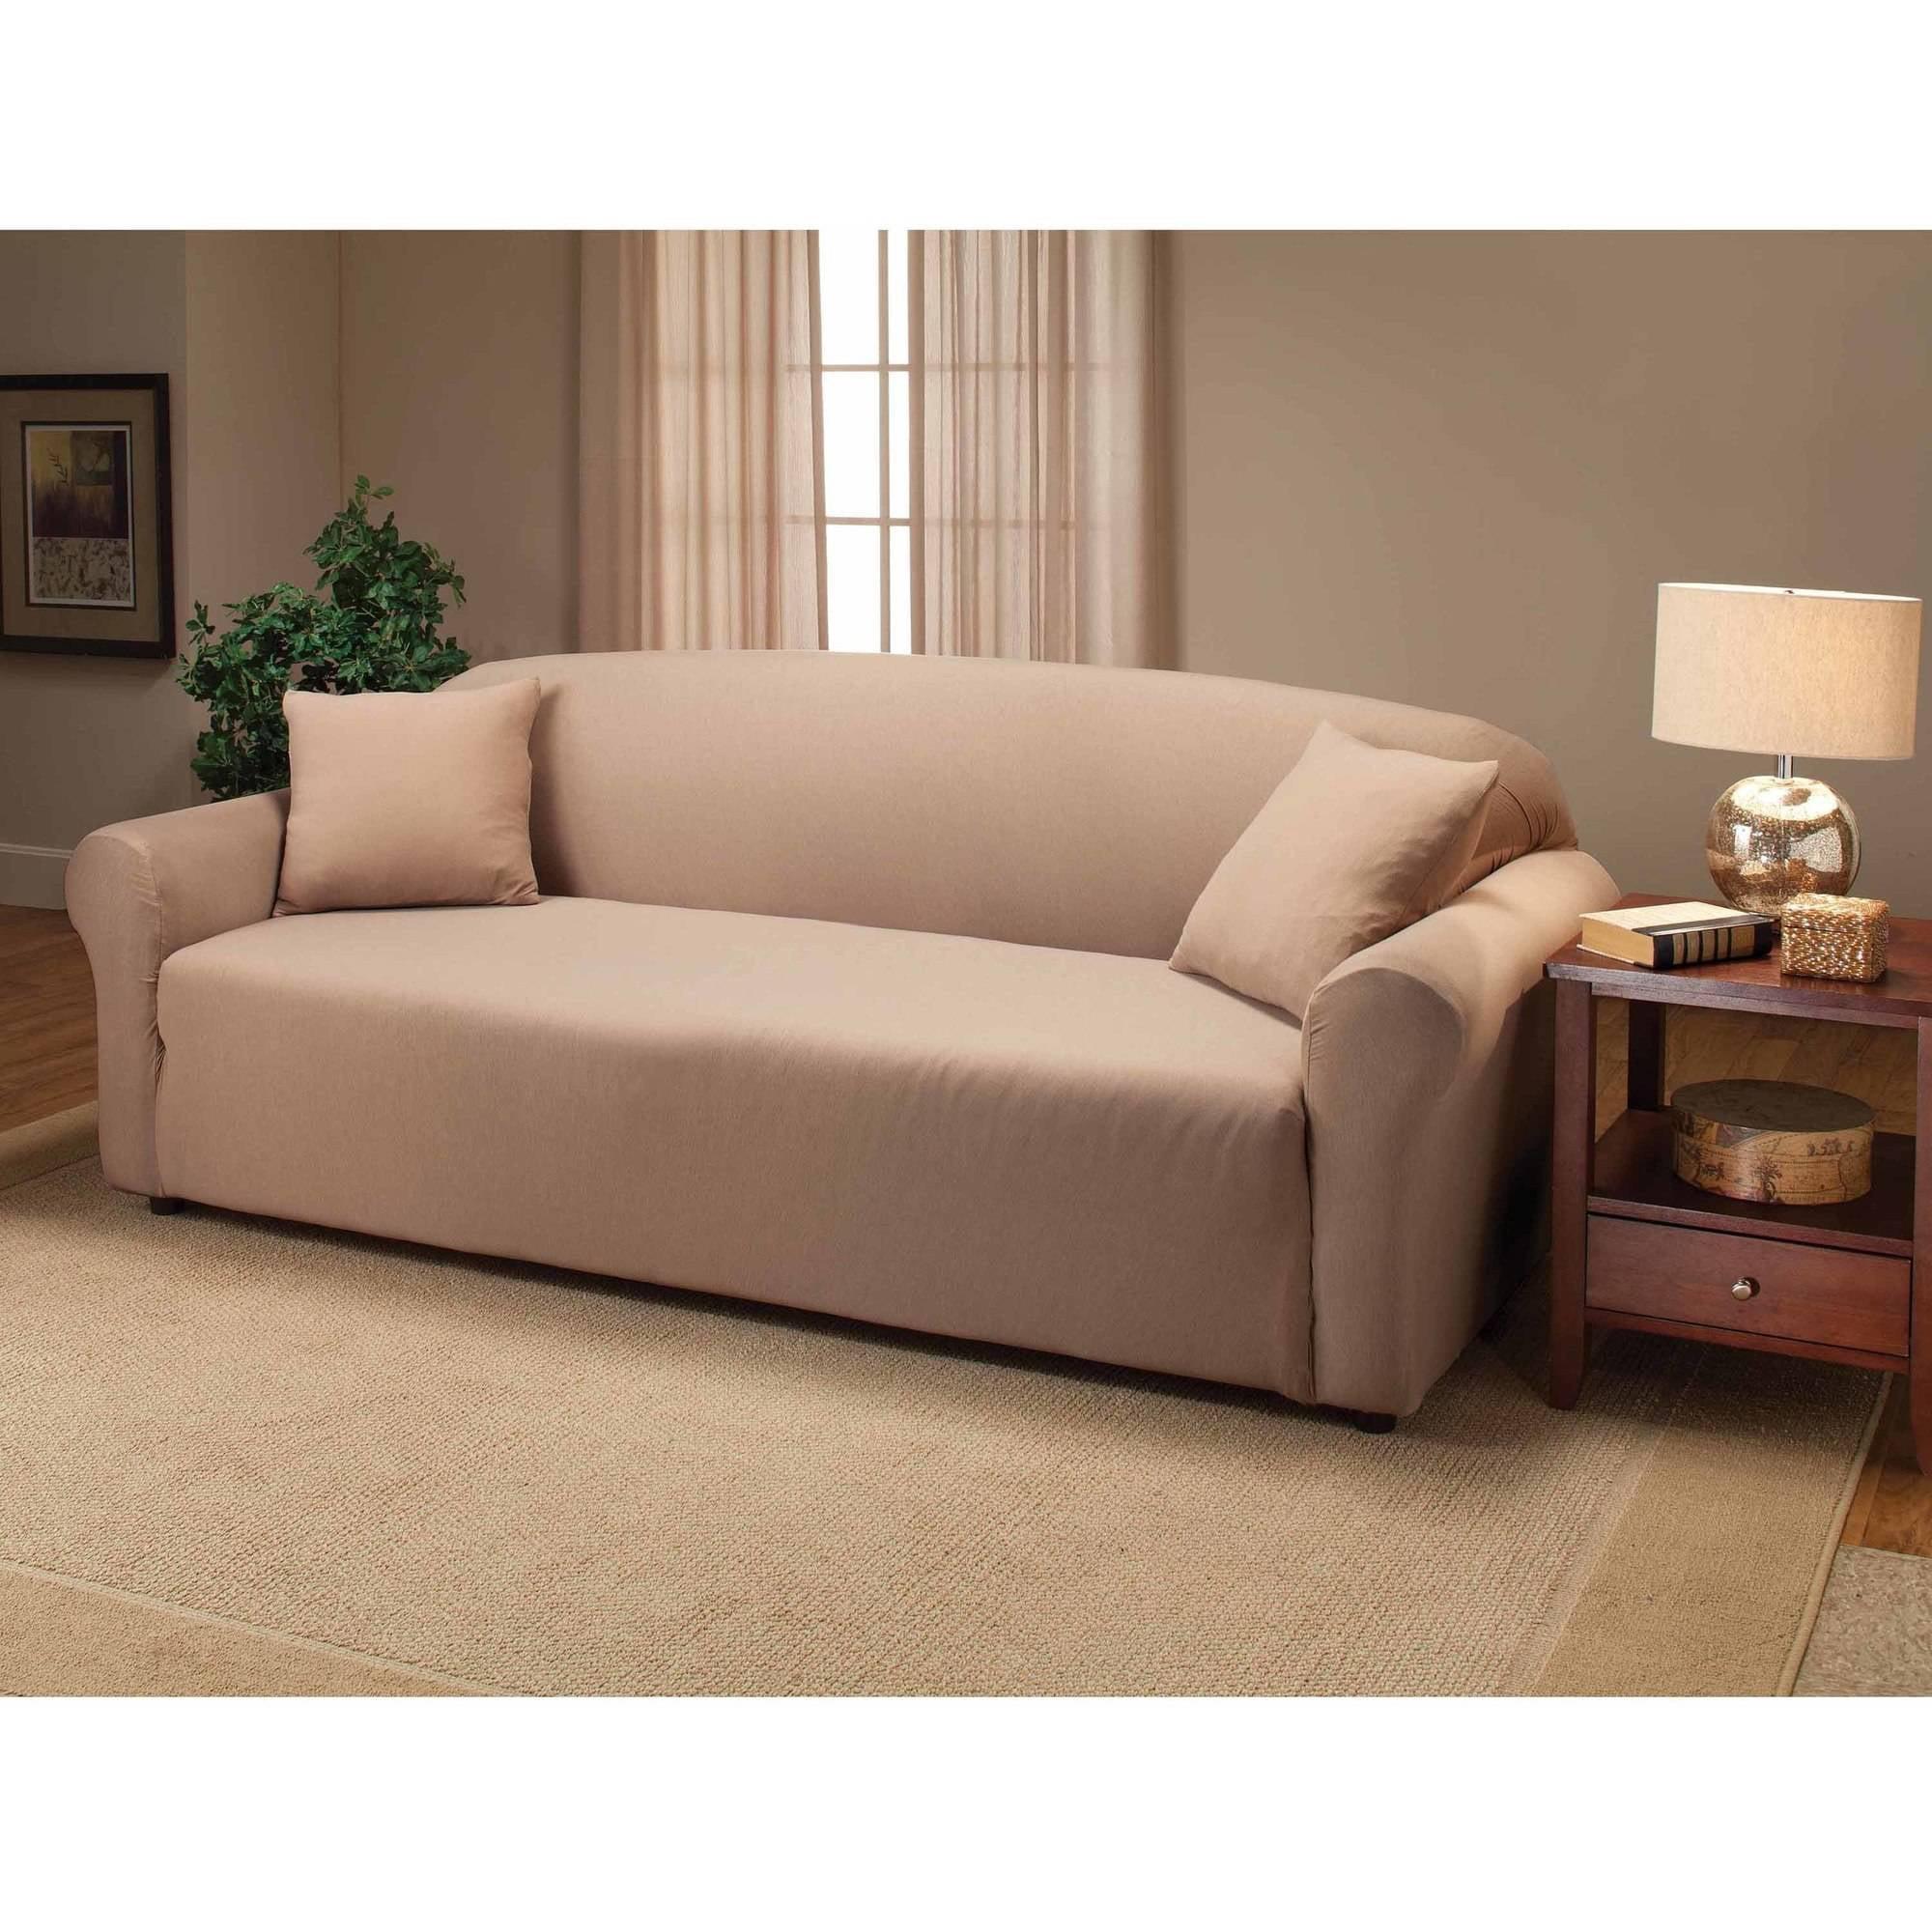 Jersey Stretch Sofa Slipcover